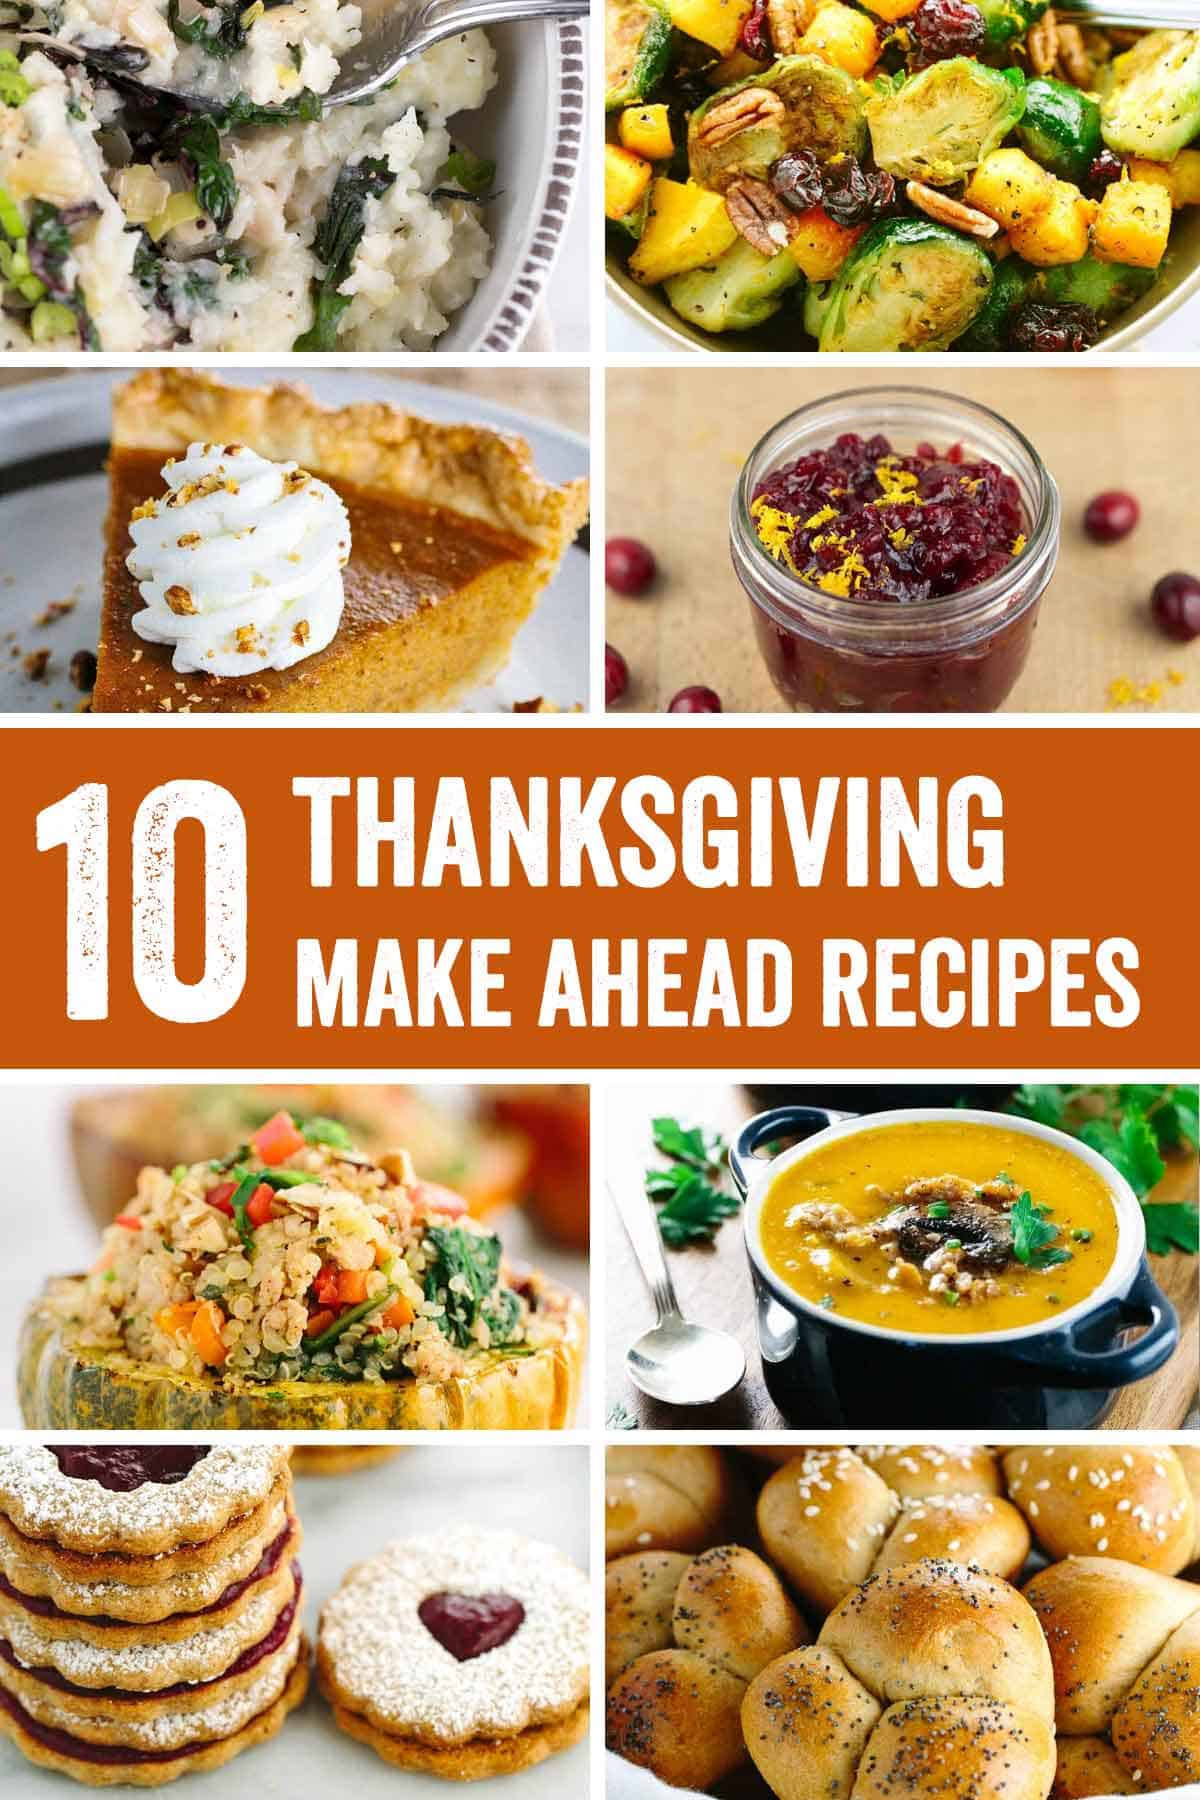 Make Ahead Thanksgiving  Roundup 10 Thanksgiving Make Ahead Recipes